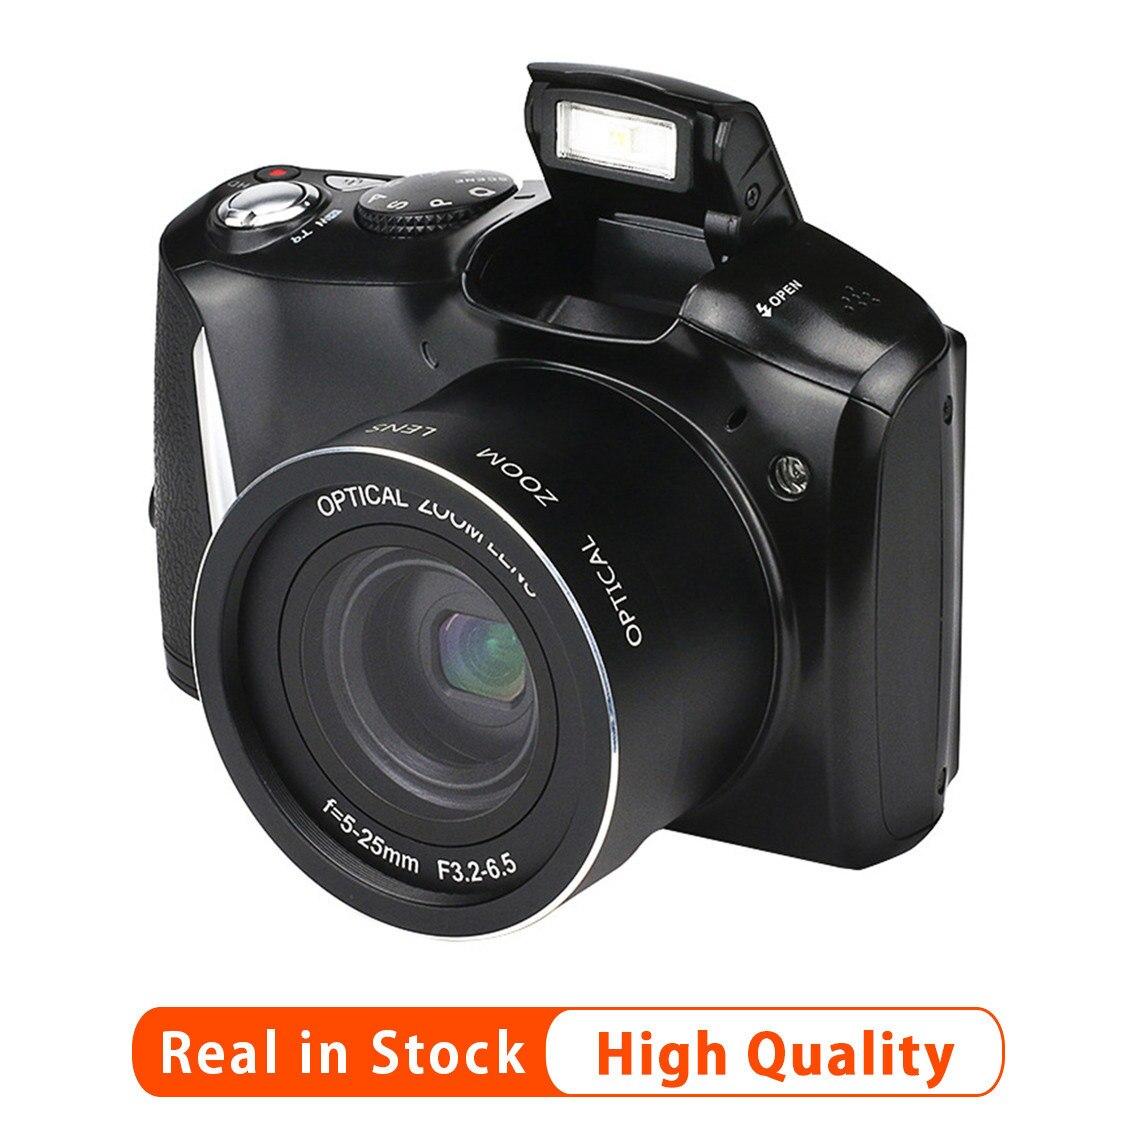 Nova 24 Megapixel HD Telefoto Câmera Digital SLR 14MP CMOS 20 Vezes Zoom Digital SLR Câmera Com Tela de 3.5